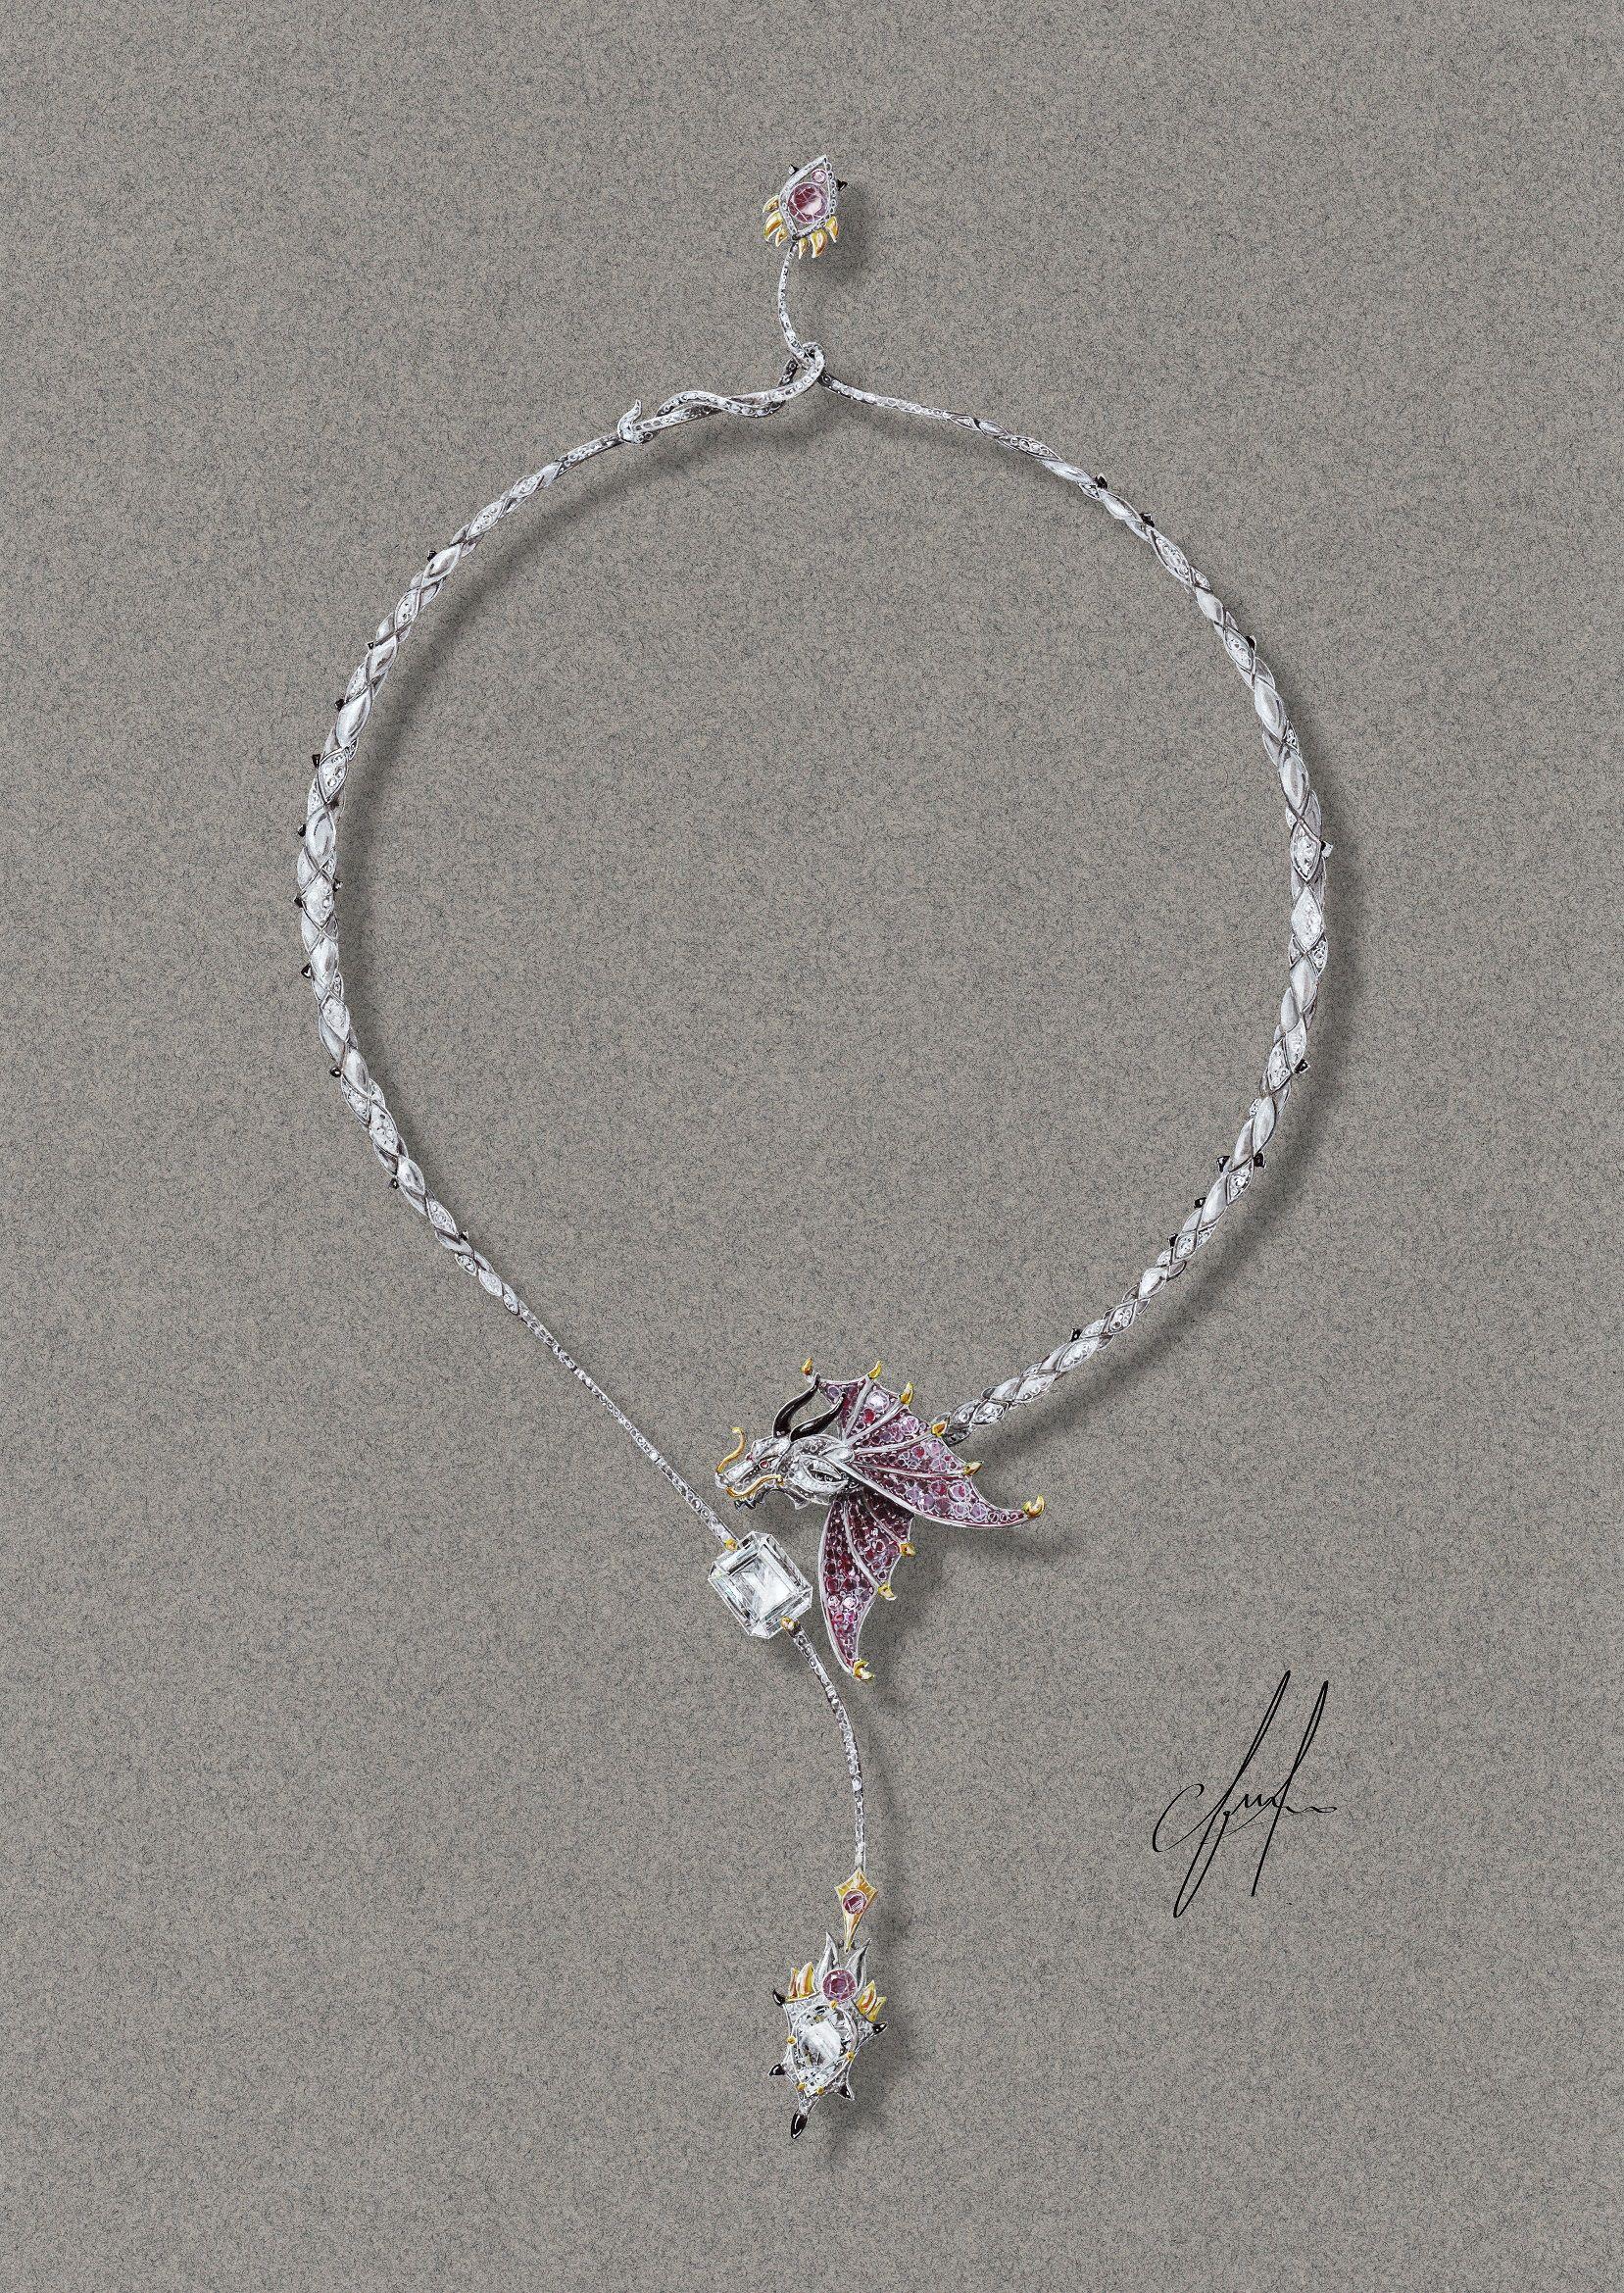 Tony FURION Dessin du collier DRAGON Design Gouache